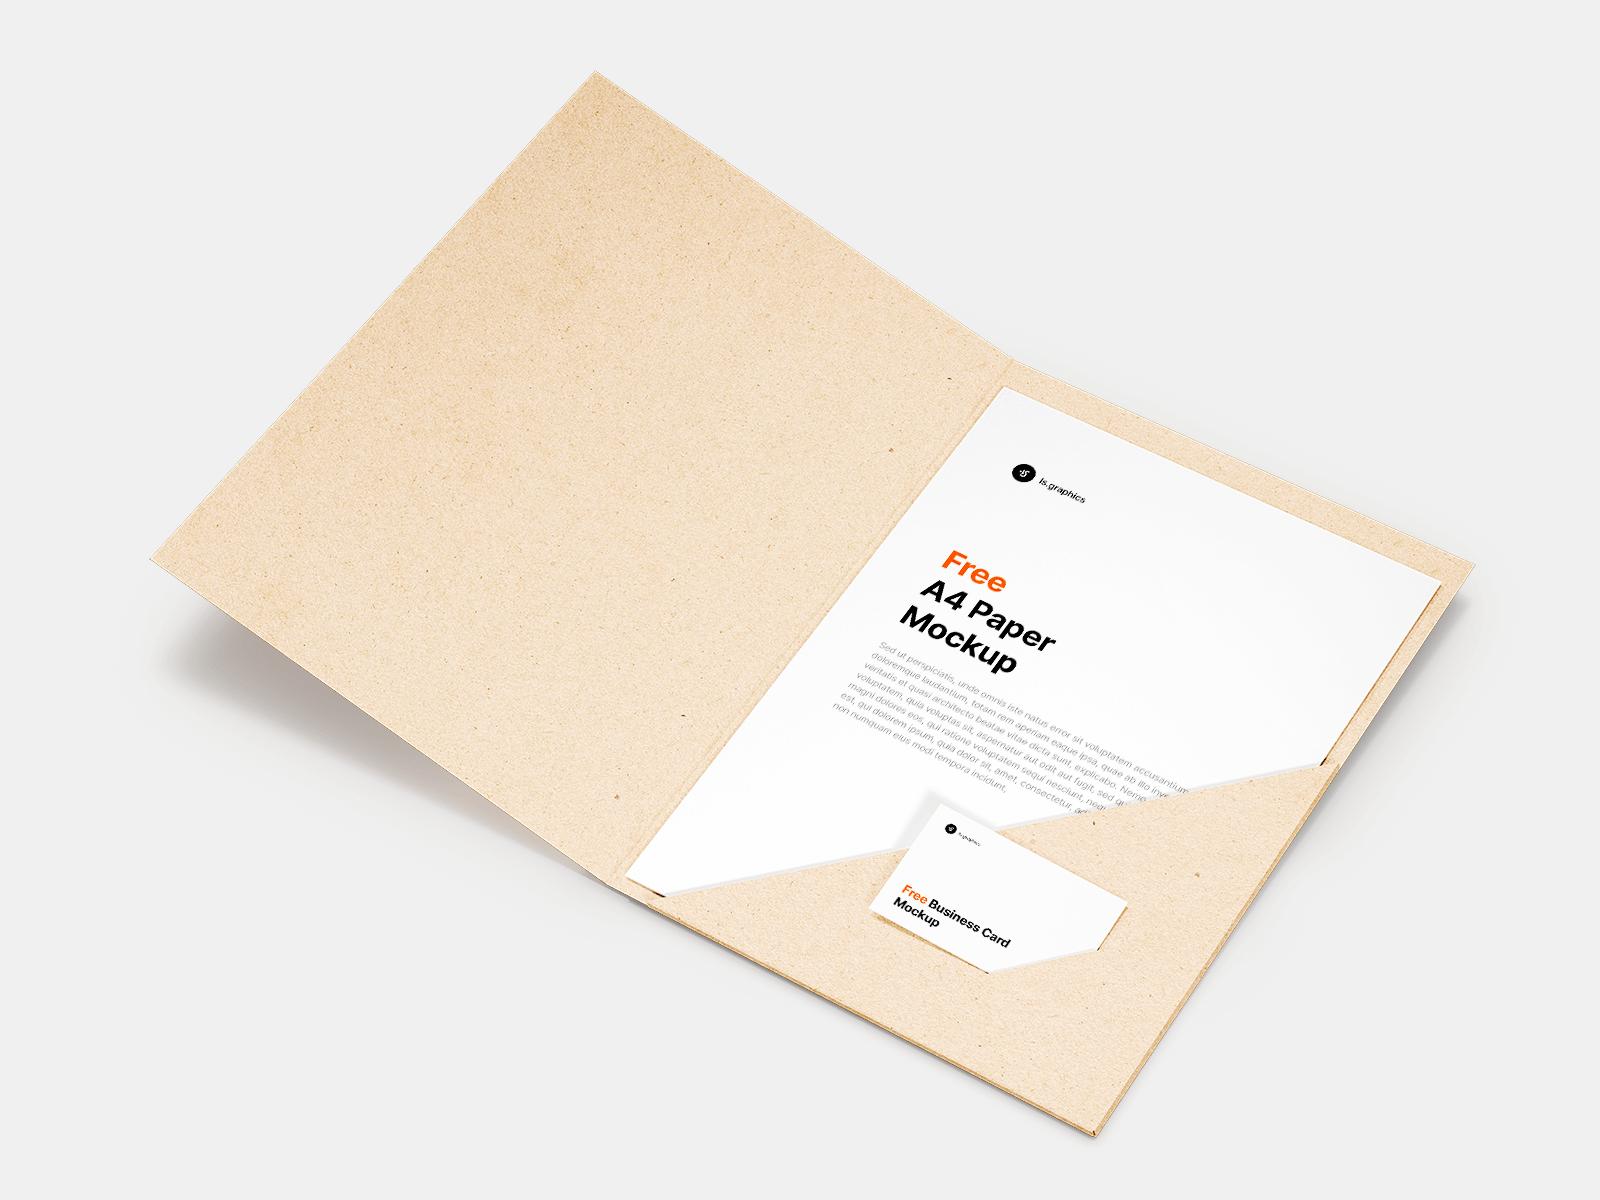 Free Folder and Business Card Mockup